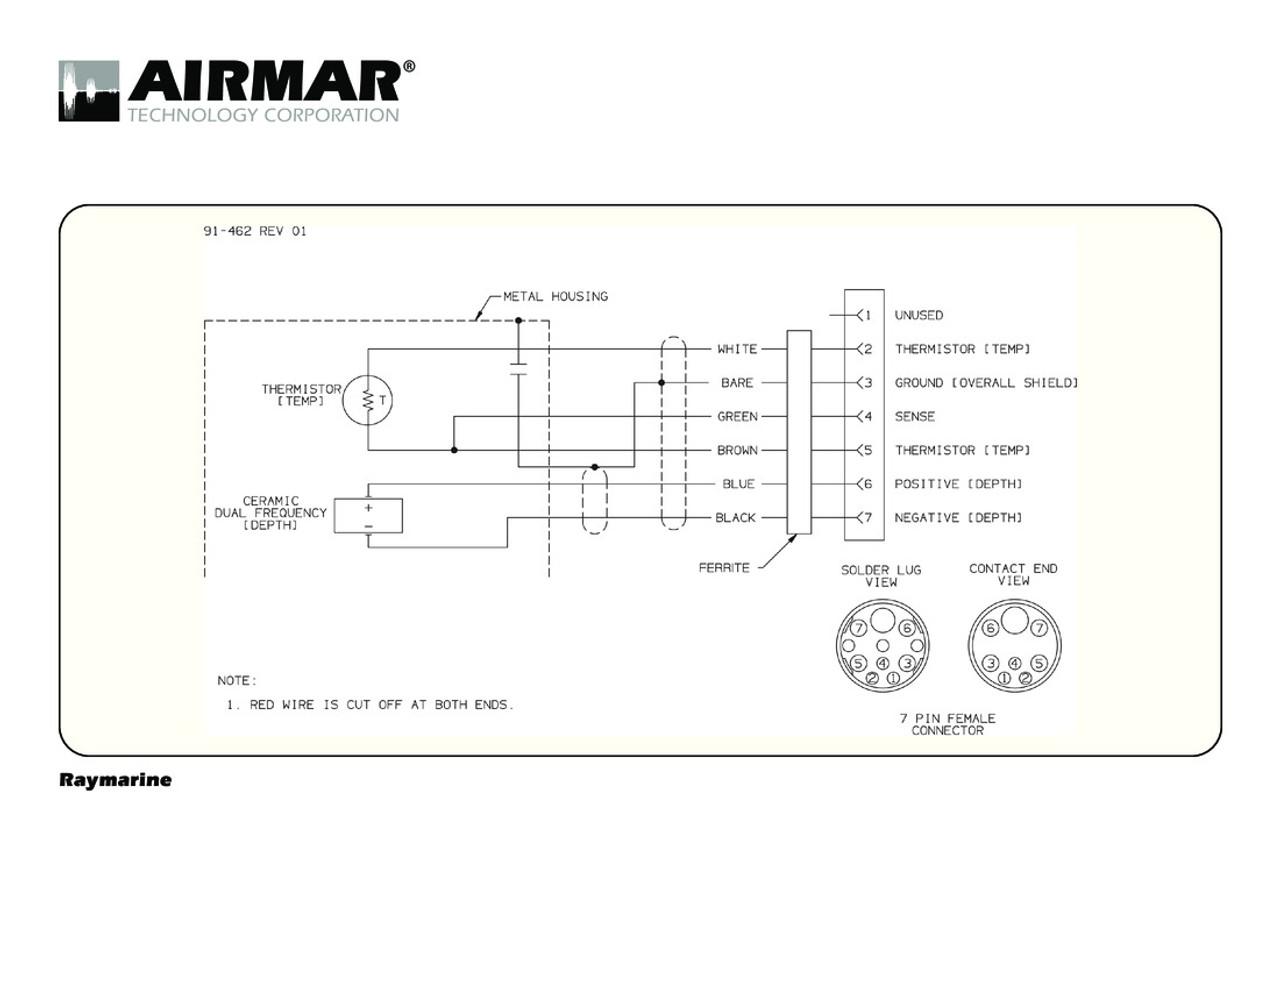 raymarine wiring diagrams wiring diagram airmar wiring diagram raymarine 7 pin d t  [ 1280 x 989 Pixel ]